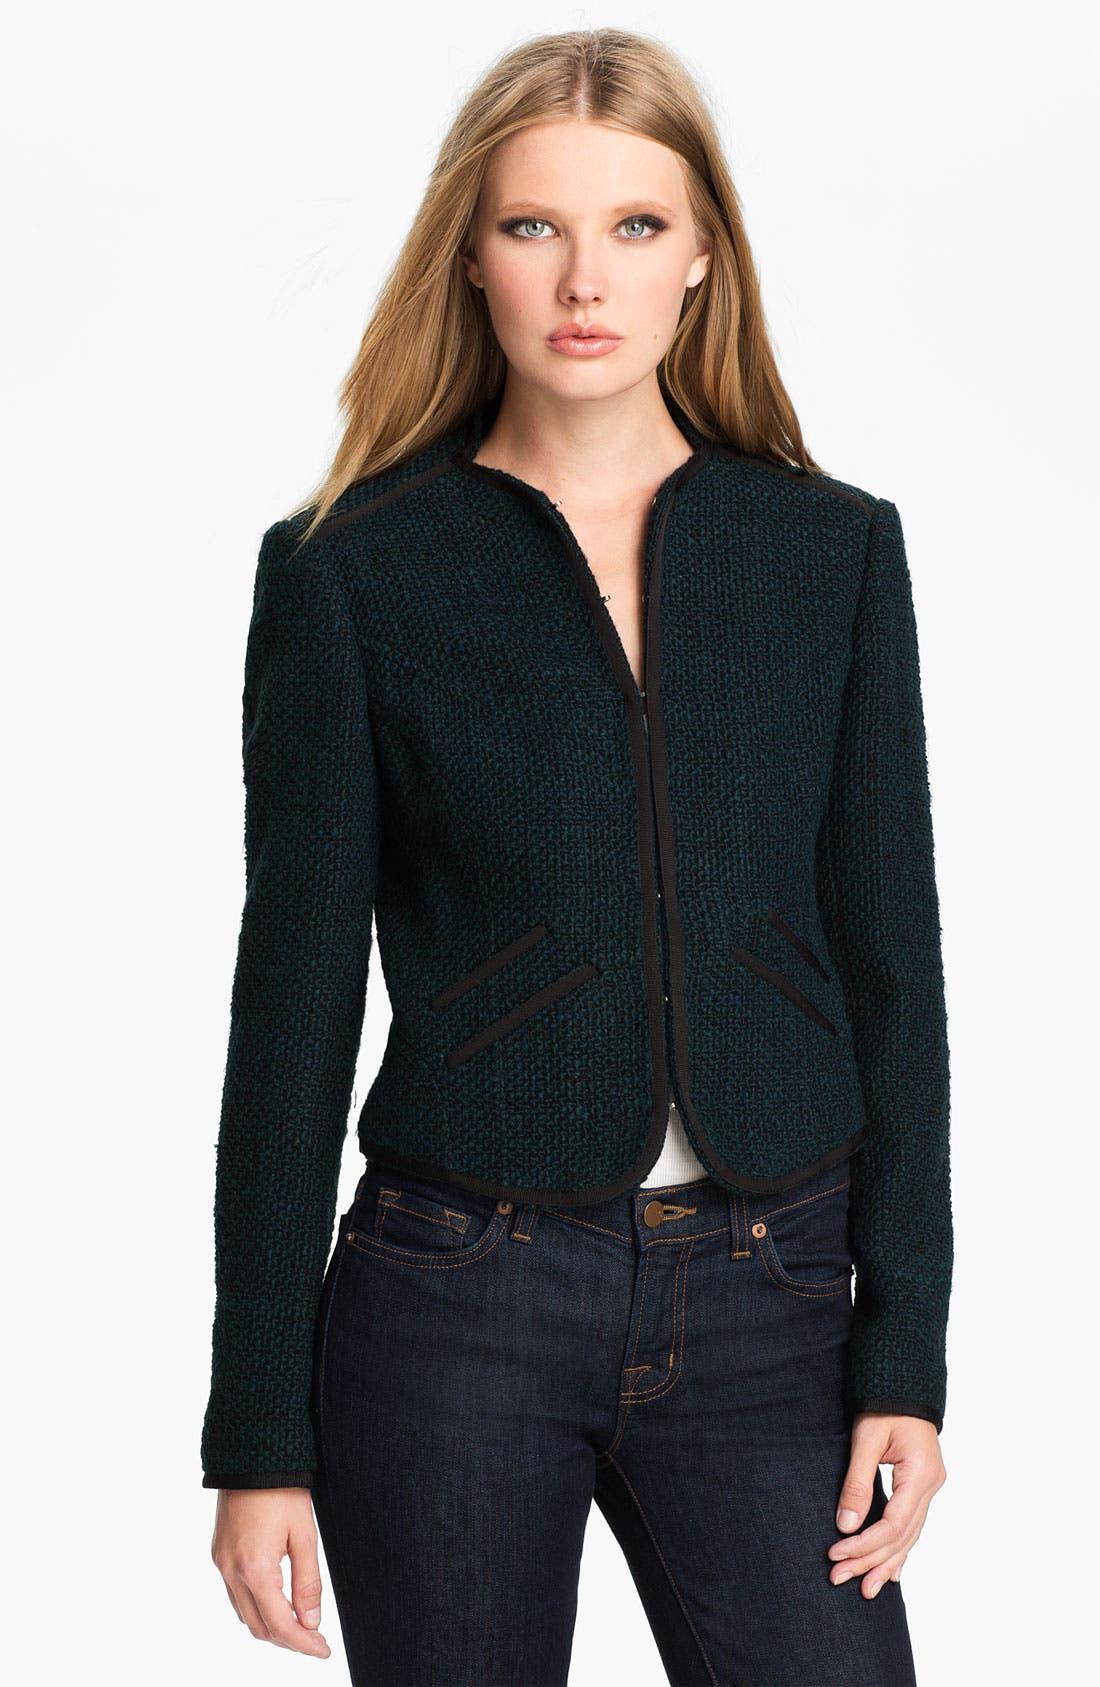 Alternate Image 1 Selected - Ted Baker London 'Pebelle' Crop Jacket